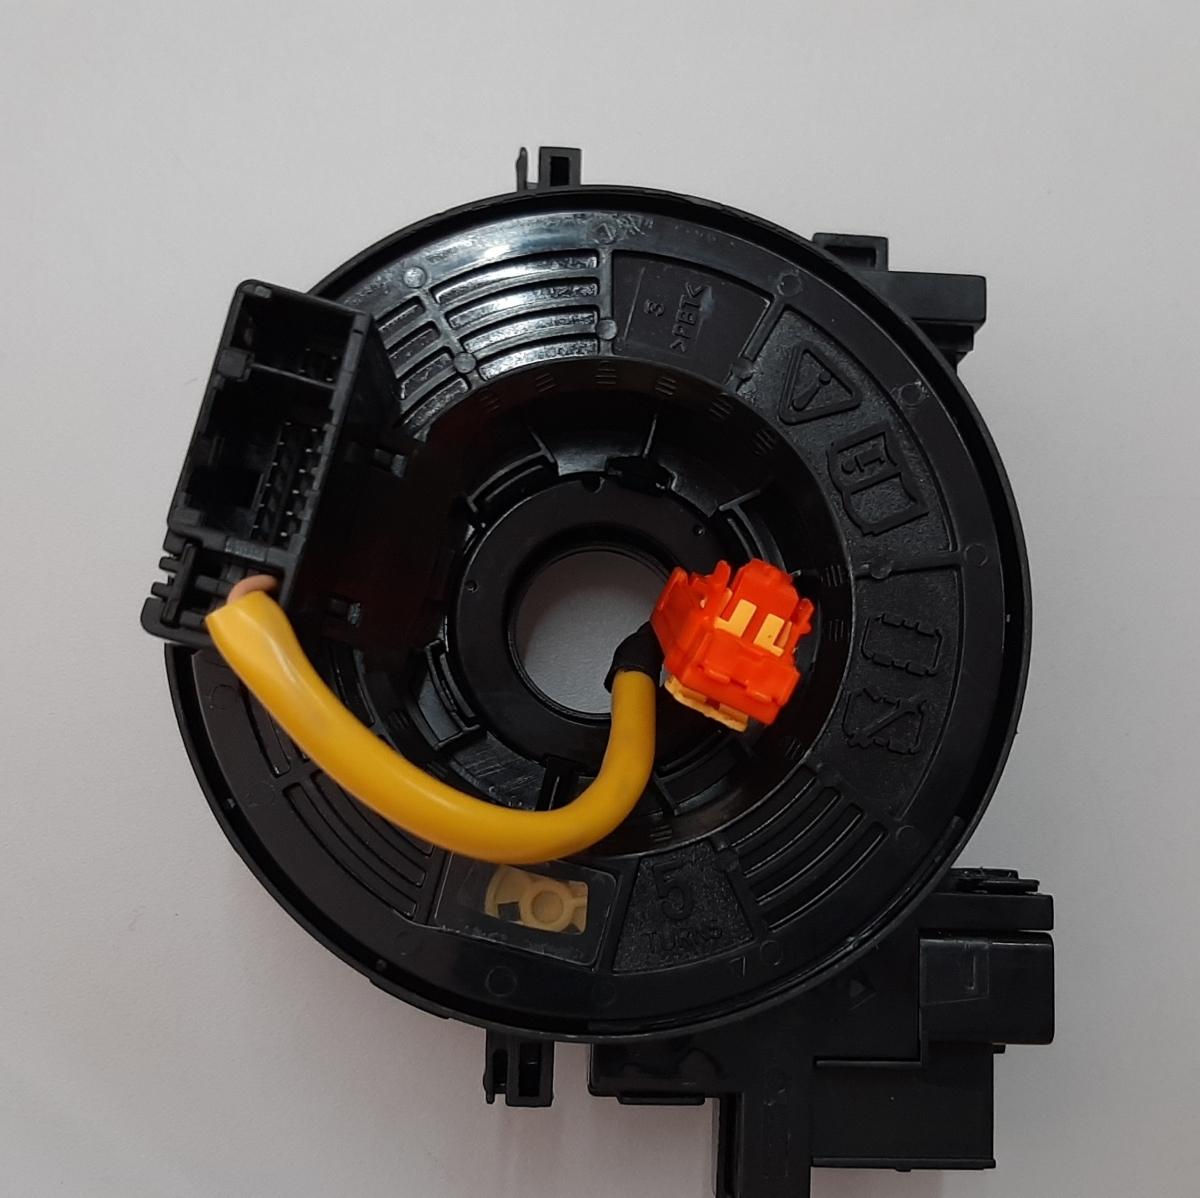 Fita Hard Disk Corolla 15 - Foto 2